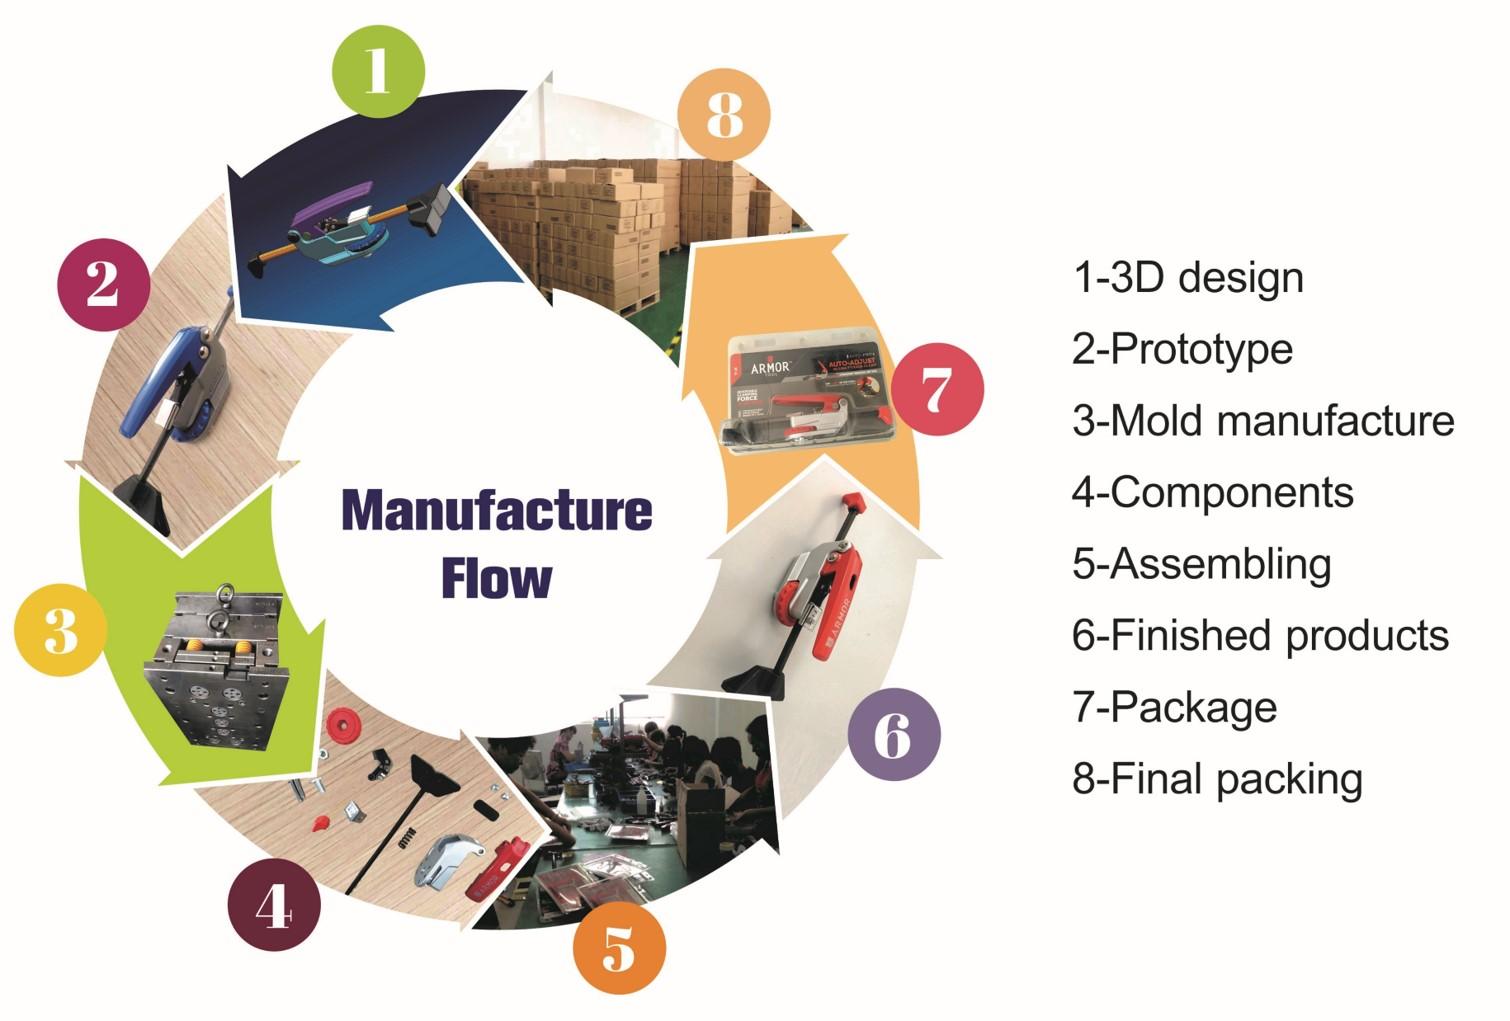 Manufacture flow